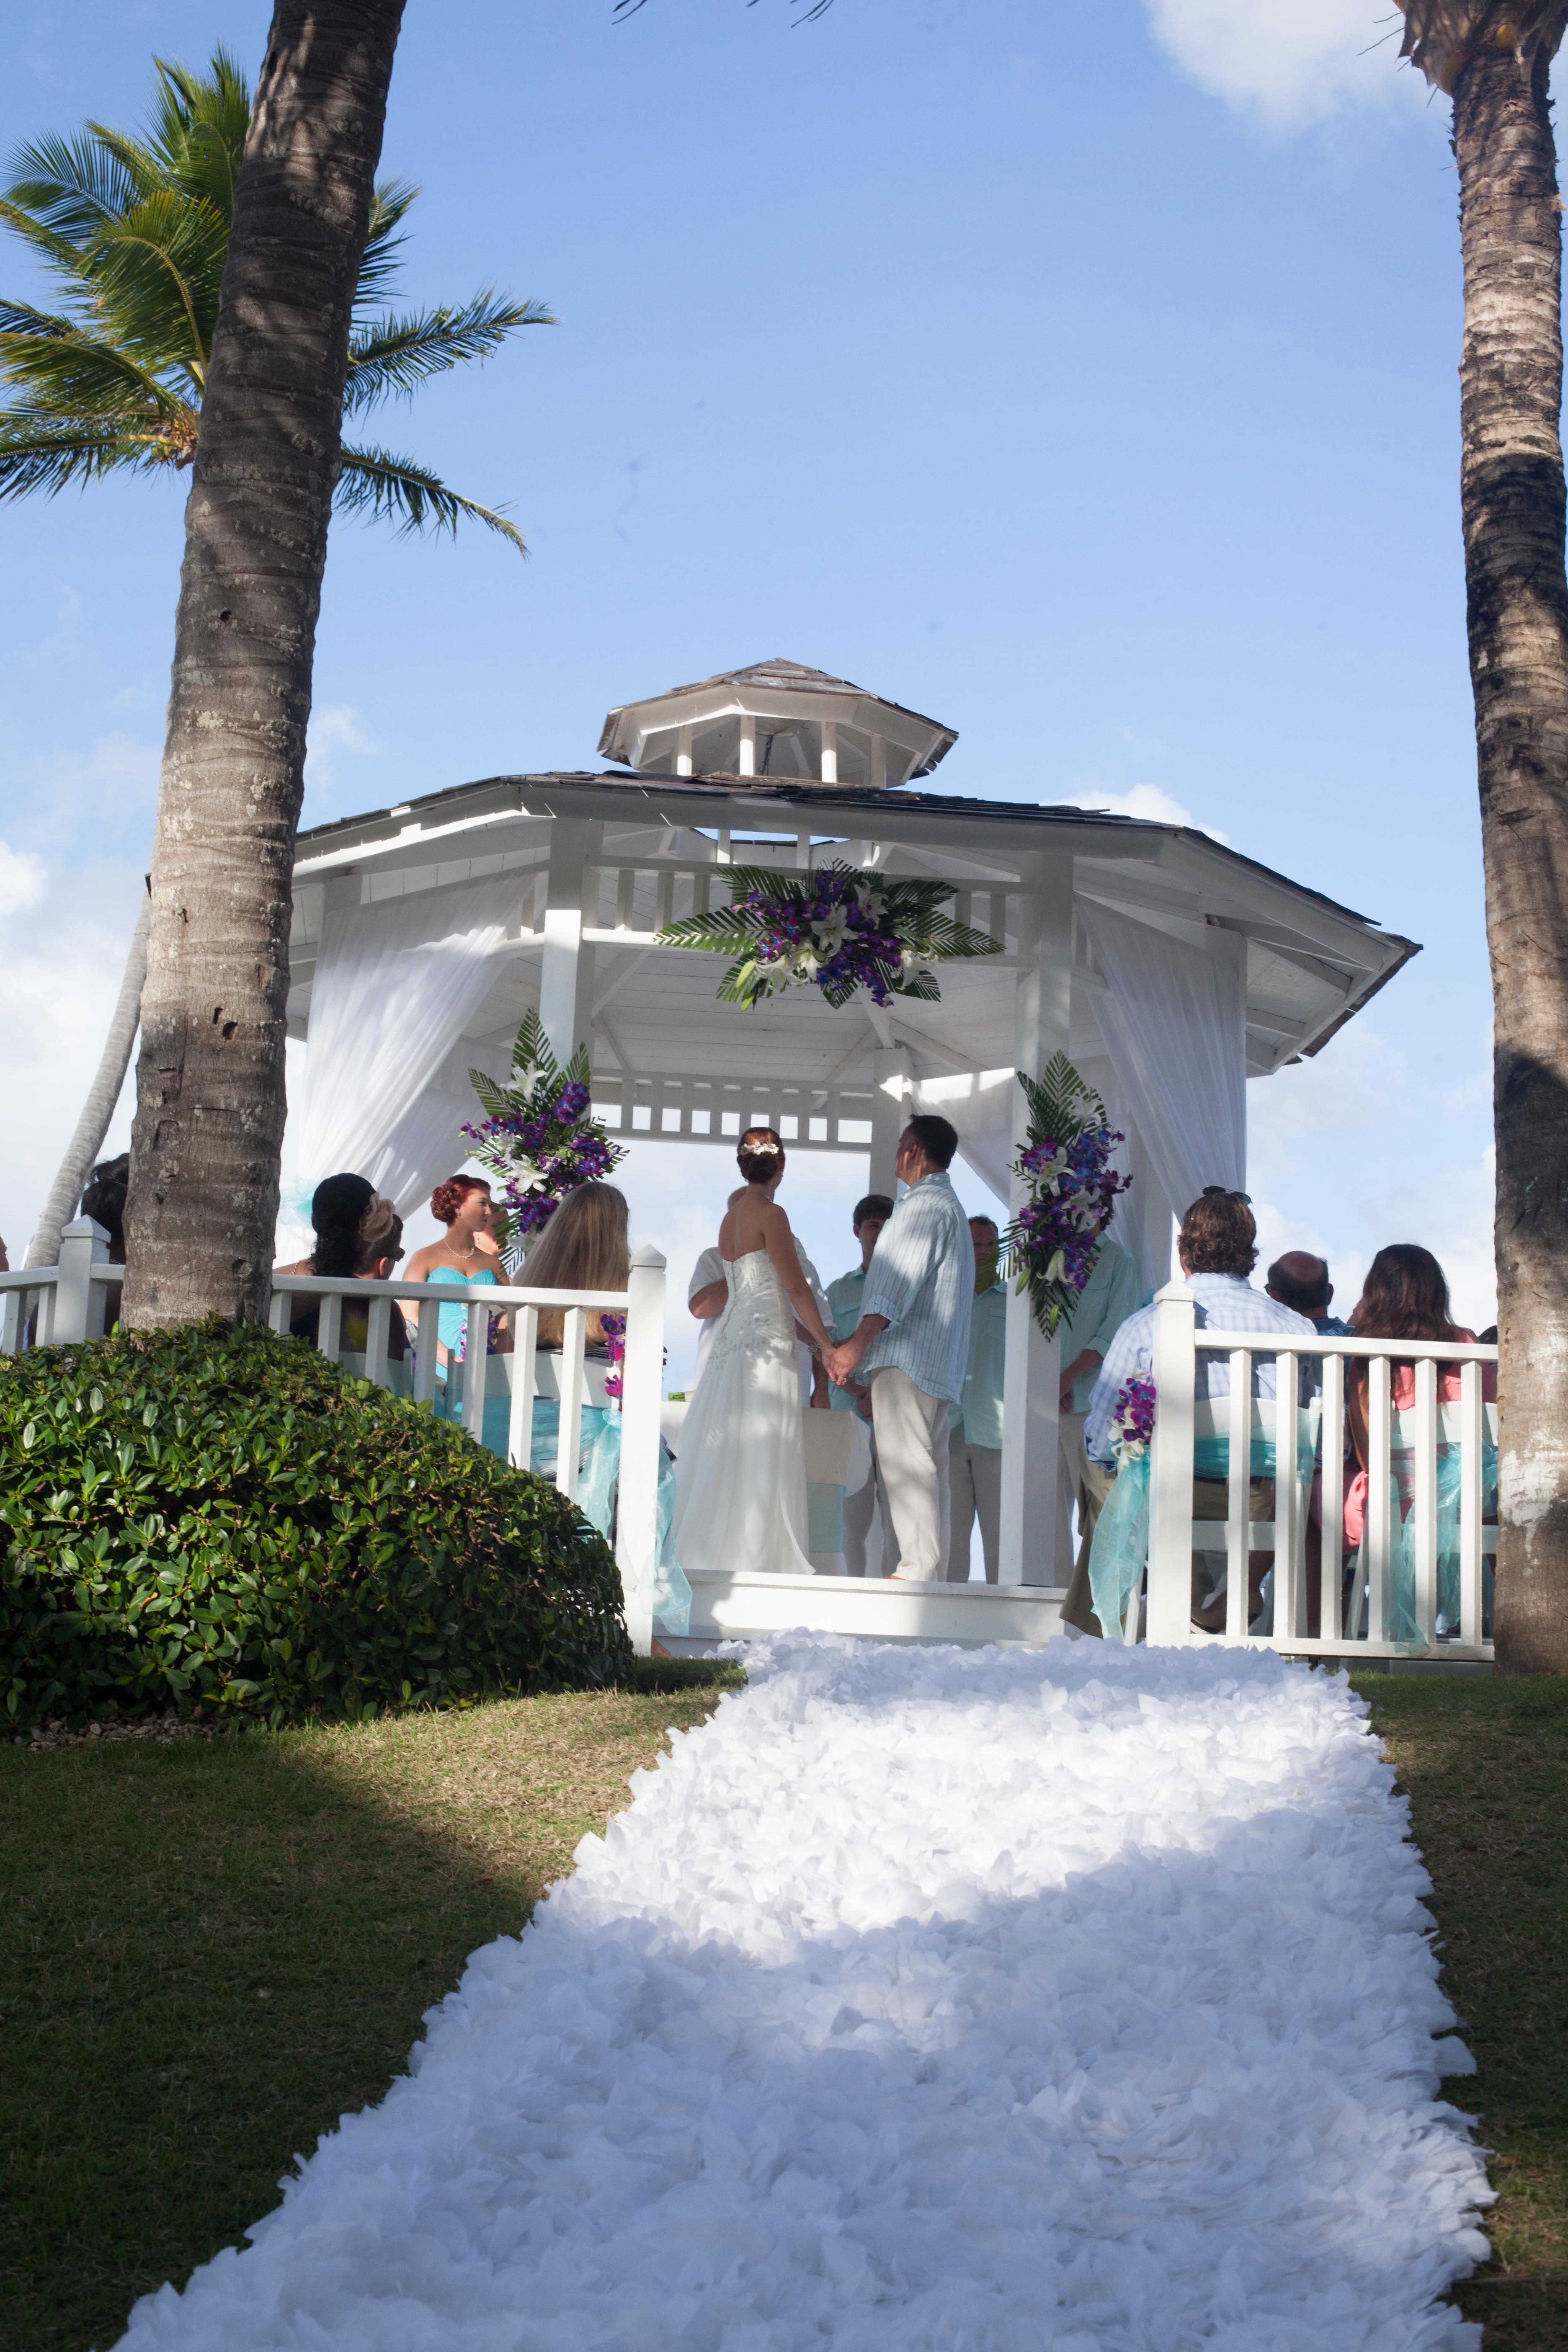 Paradisus Punta Cana Wedding Planner Theresa Calcos Barefoot Bride International Photography Ambrogetti Ameztoy Photo Studio Http Weddingph